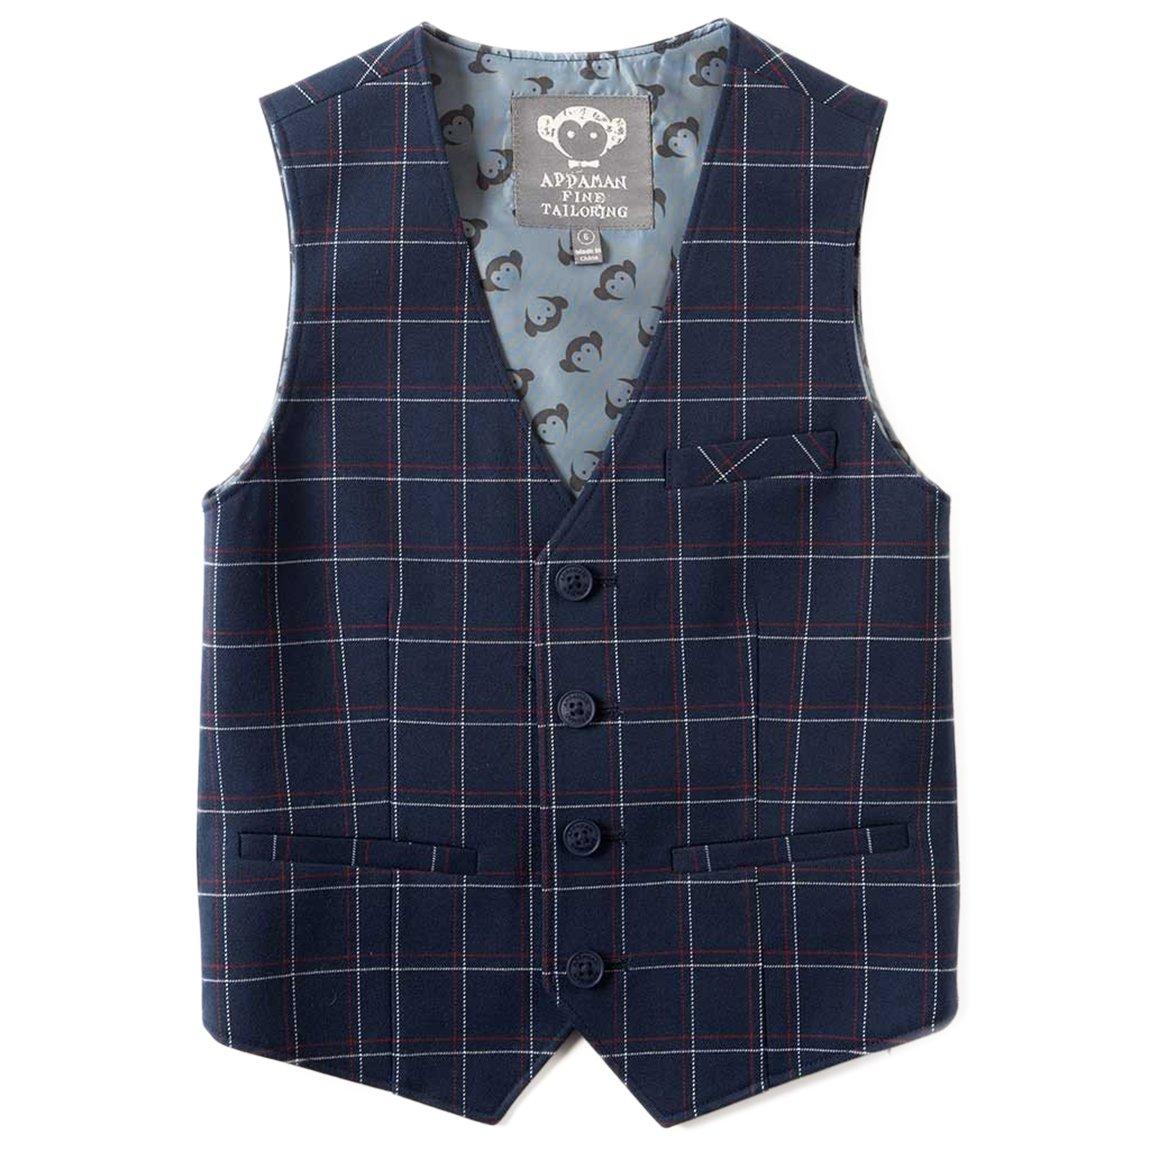 Appaman Little Boys' Tailored Vest in Navy Windowpane 5